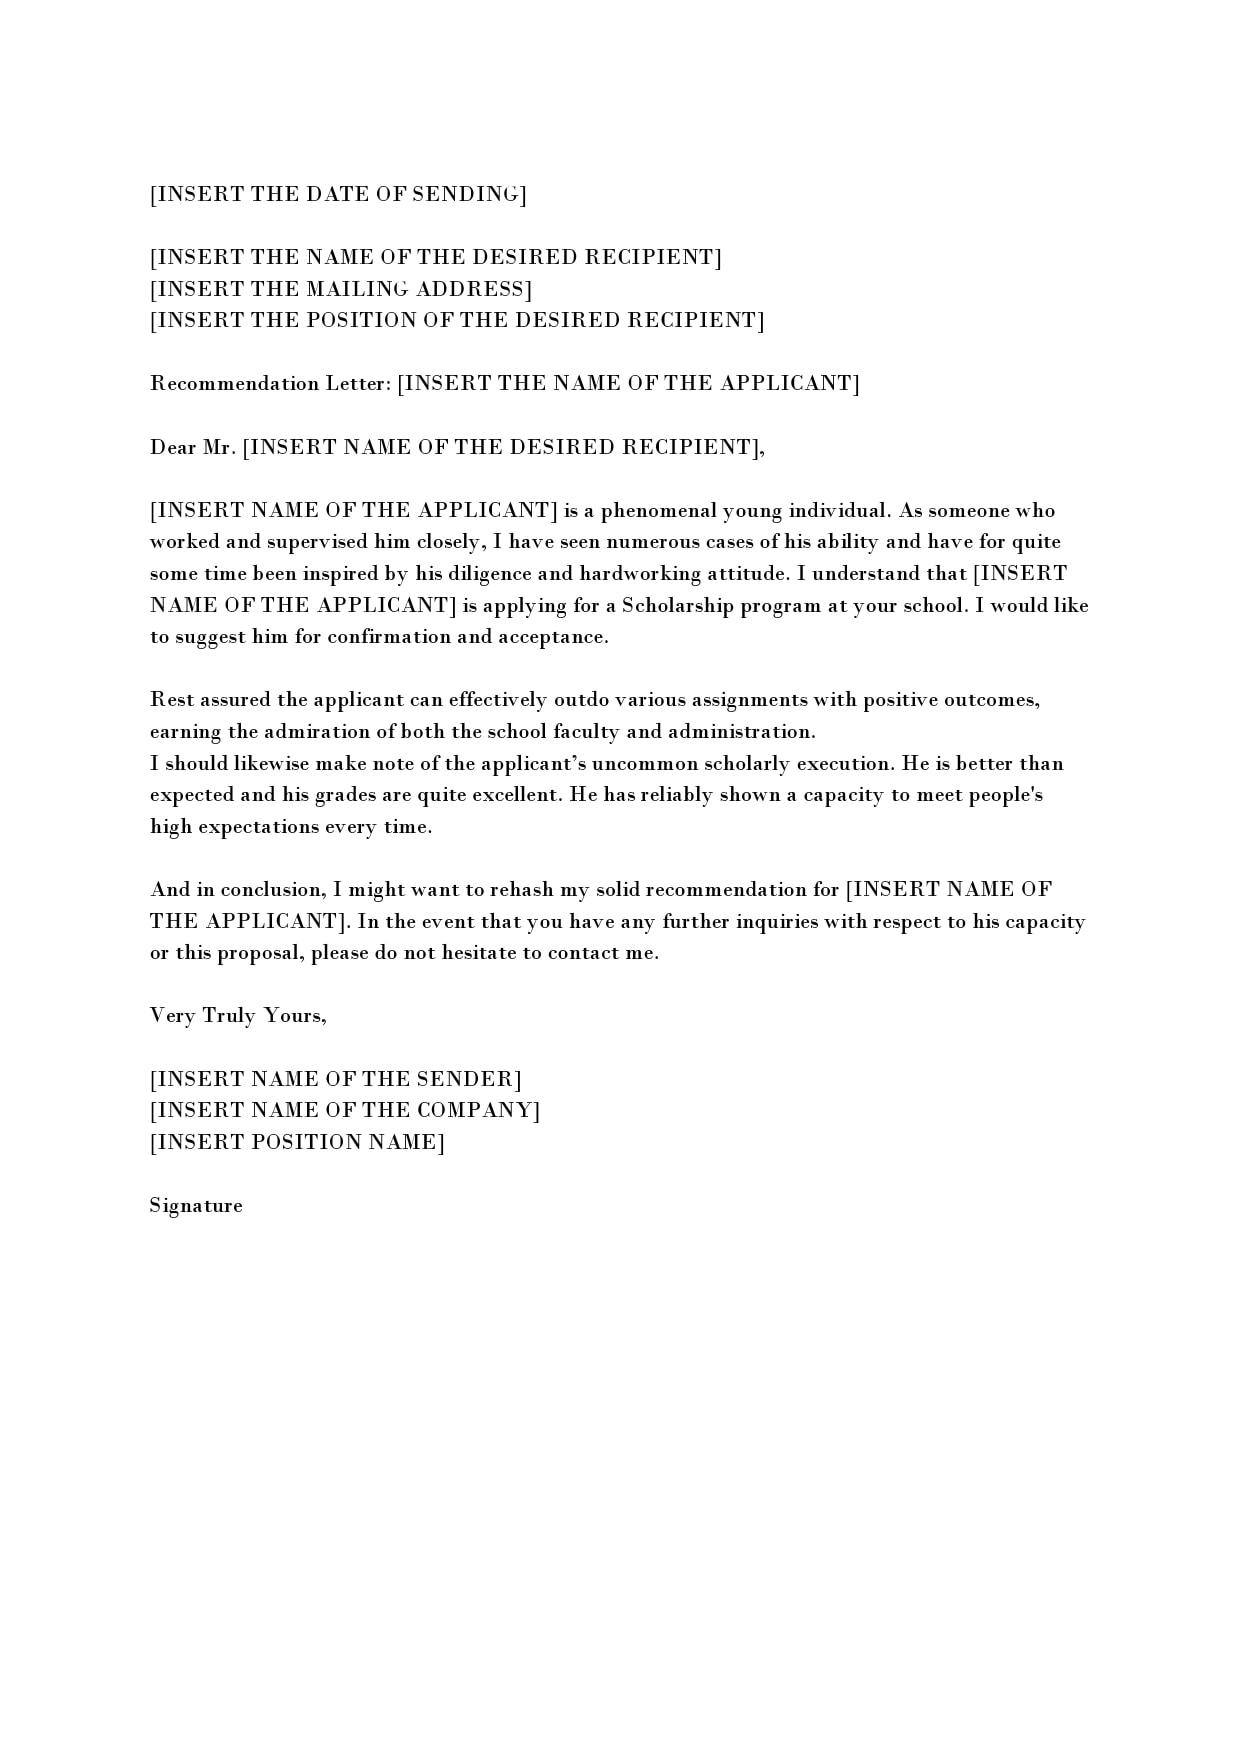 recommendation letter for scholarship 02